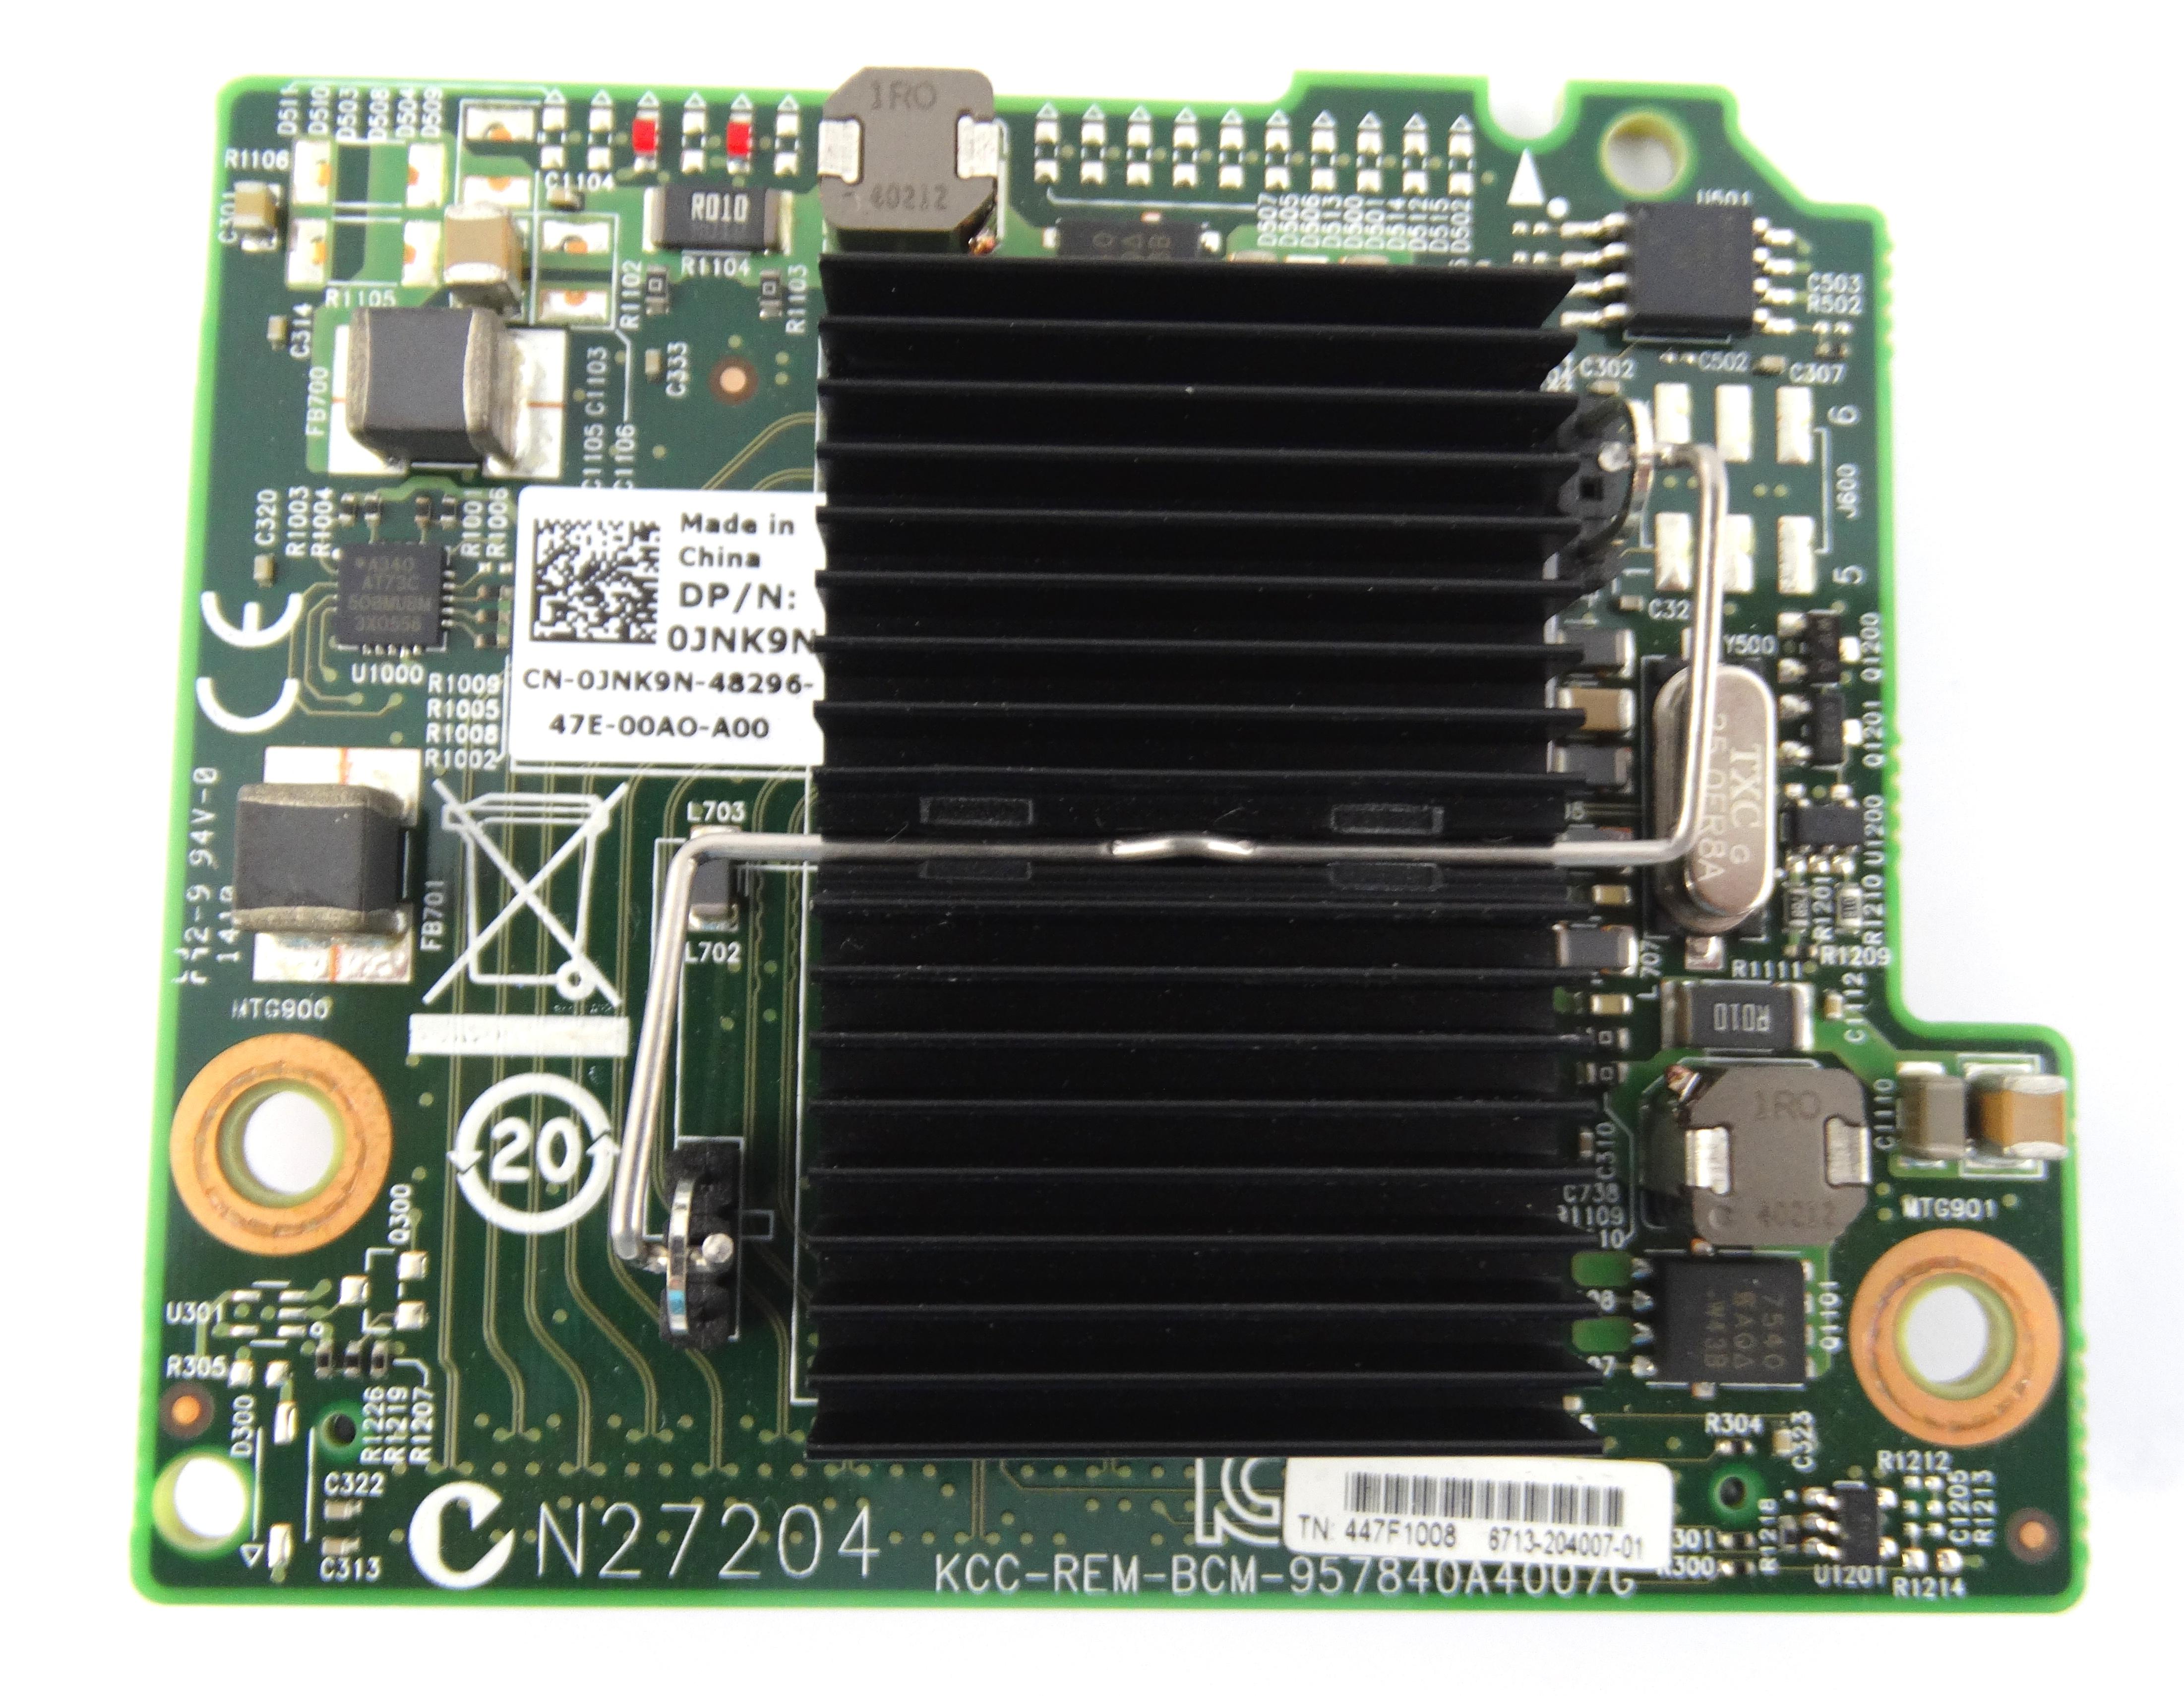 Dell Broadcom 10Gbe 4 Port Daughter Card (BROADCOM)